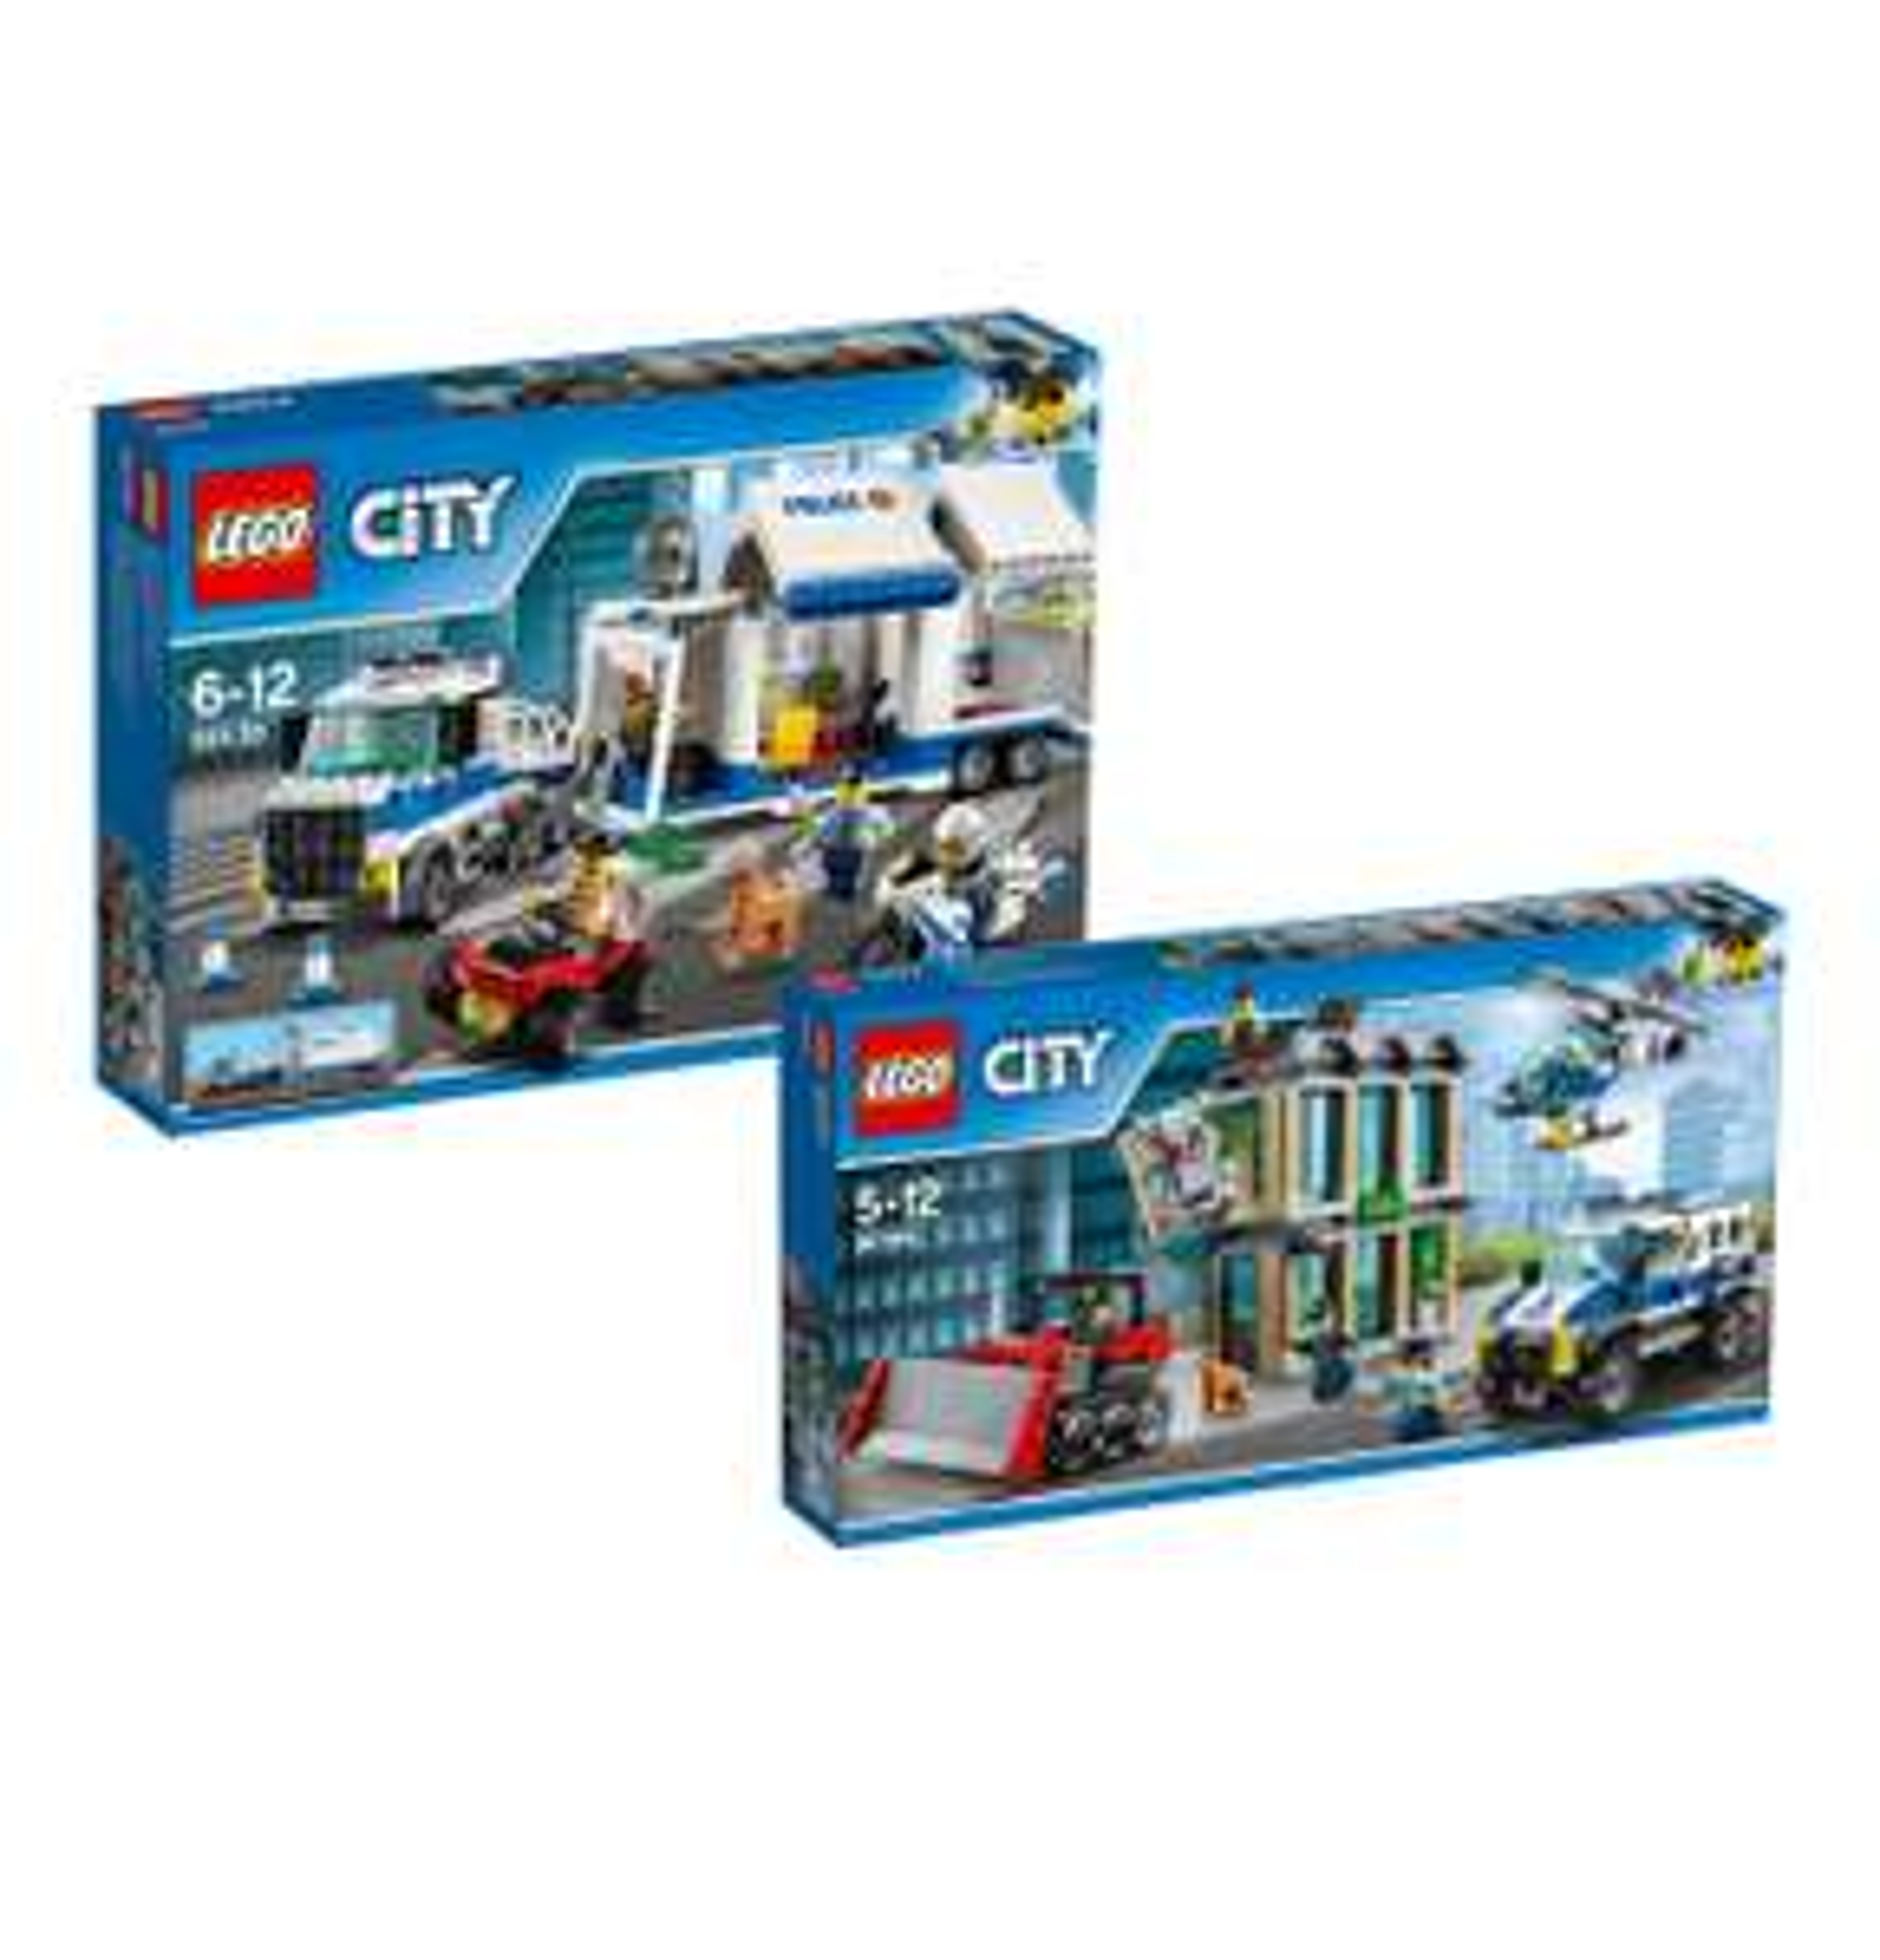 LEGO City Bankraub (60140) + Polizei (60139) Bundle nur heute sehr günstig Galeria Kaufhof + 15-Fach Payback